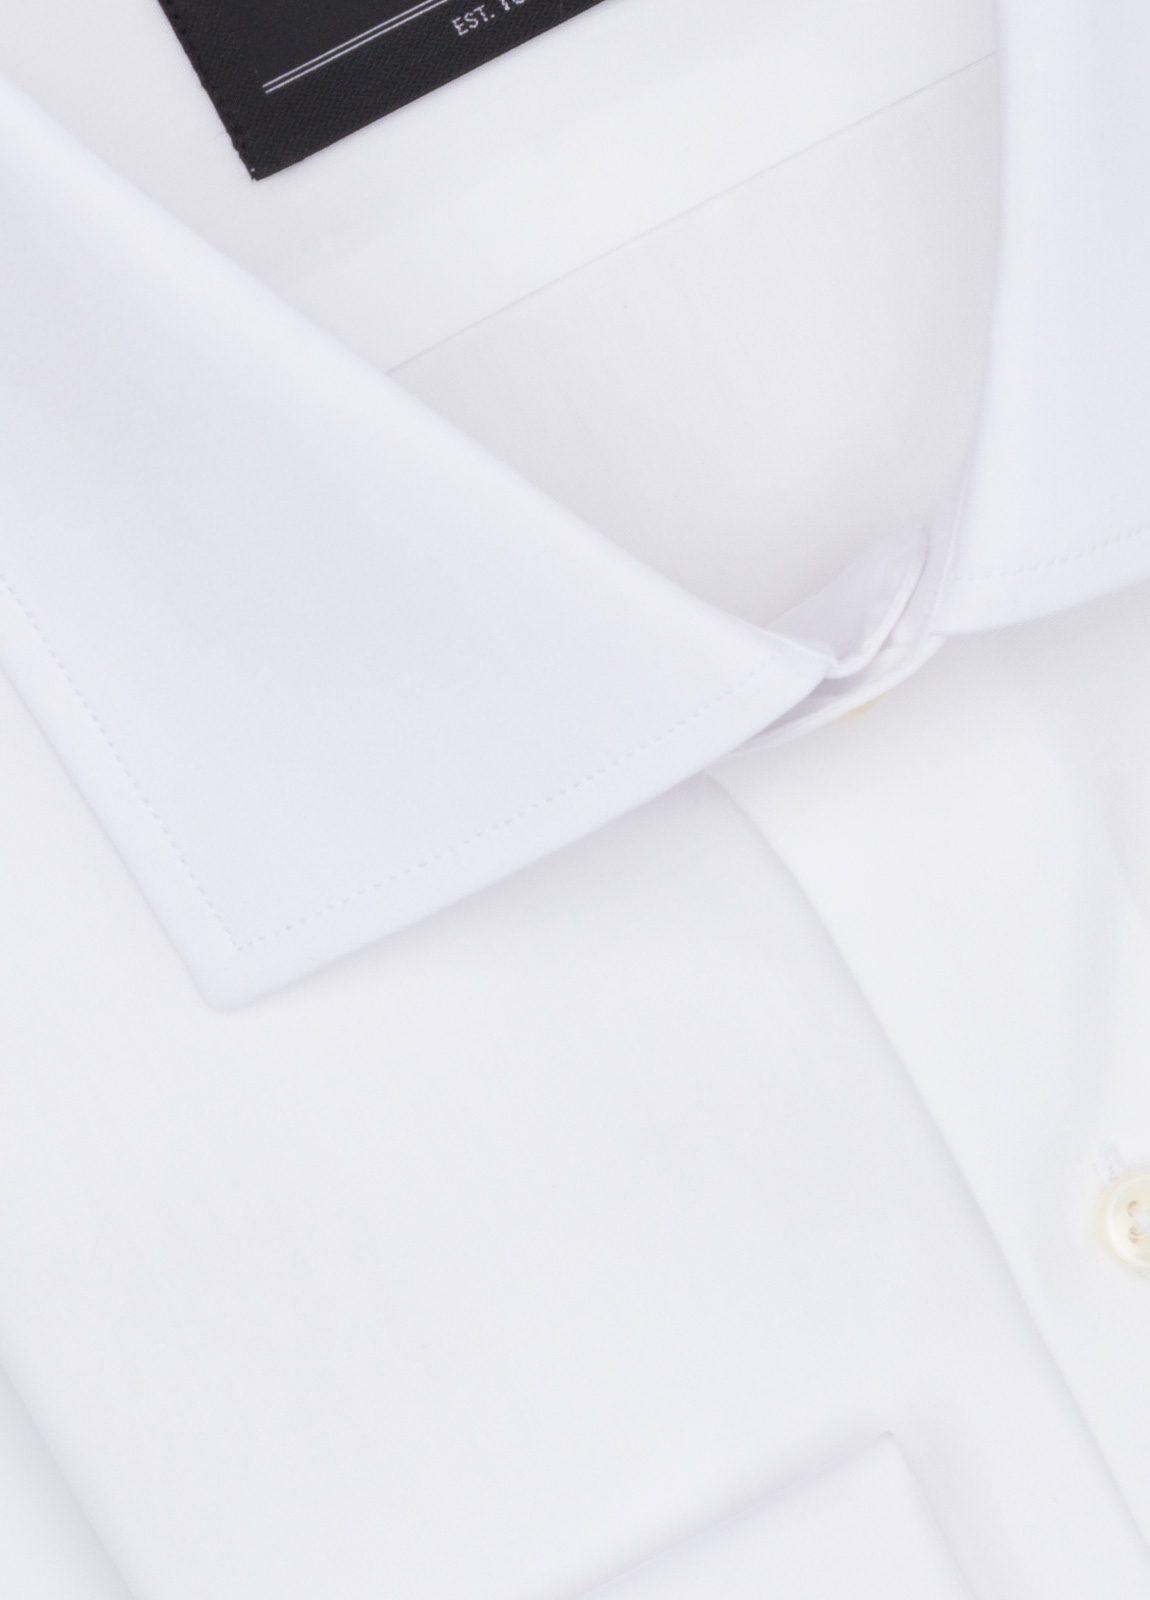 Camisa formal wear slim fit cuello italiano modelo tailored napoli. puño doble, diseño liso color blanco. 100% algodón - Ítem1